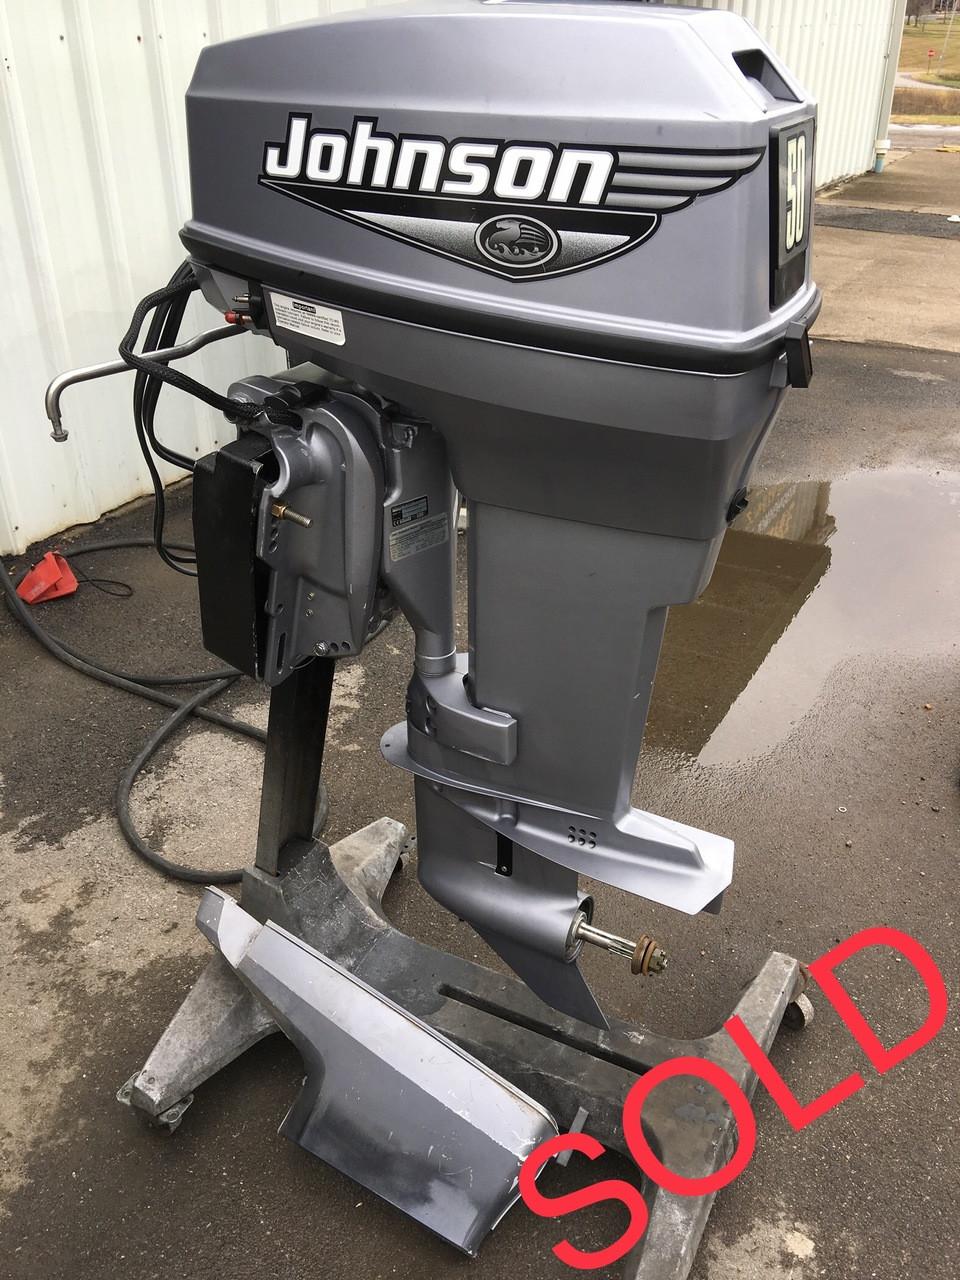 johnson outboard motors serial numbers